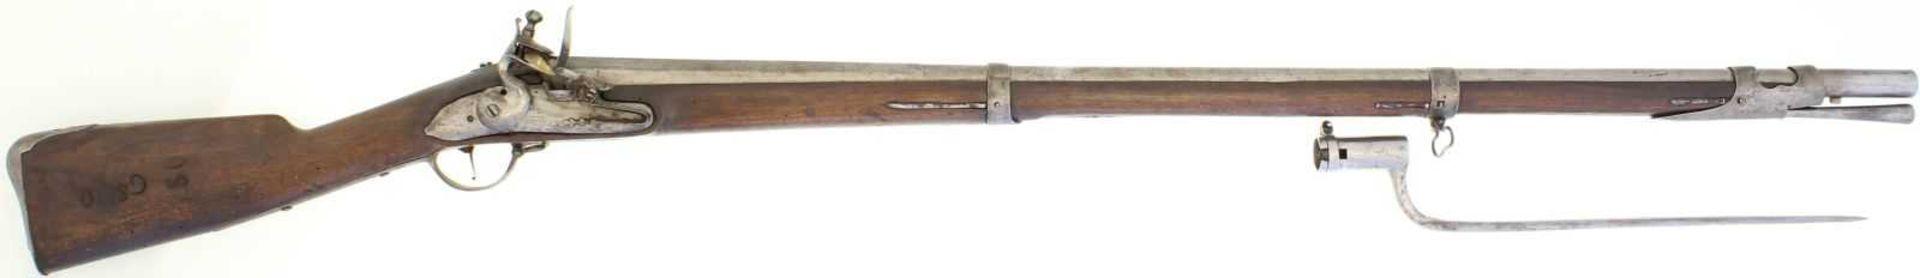 Steinschlossgewehr, Kantonale Ord. Solothurn, ca. 1770, resp. 1817, Kal. 18mm LL 1030mm, TL